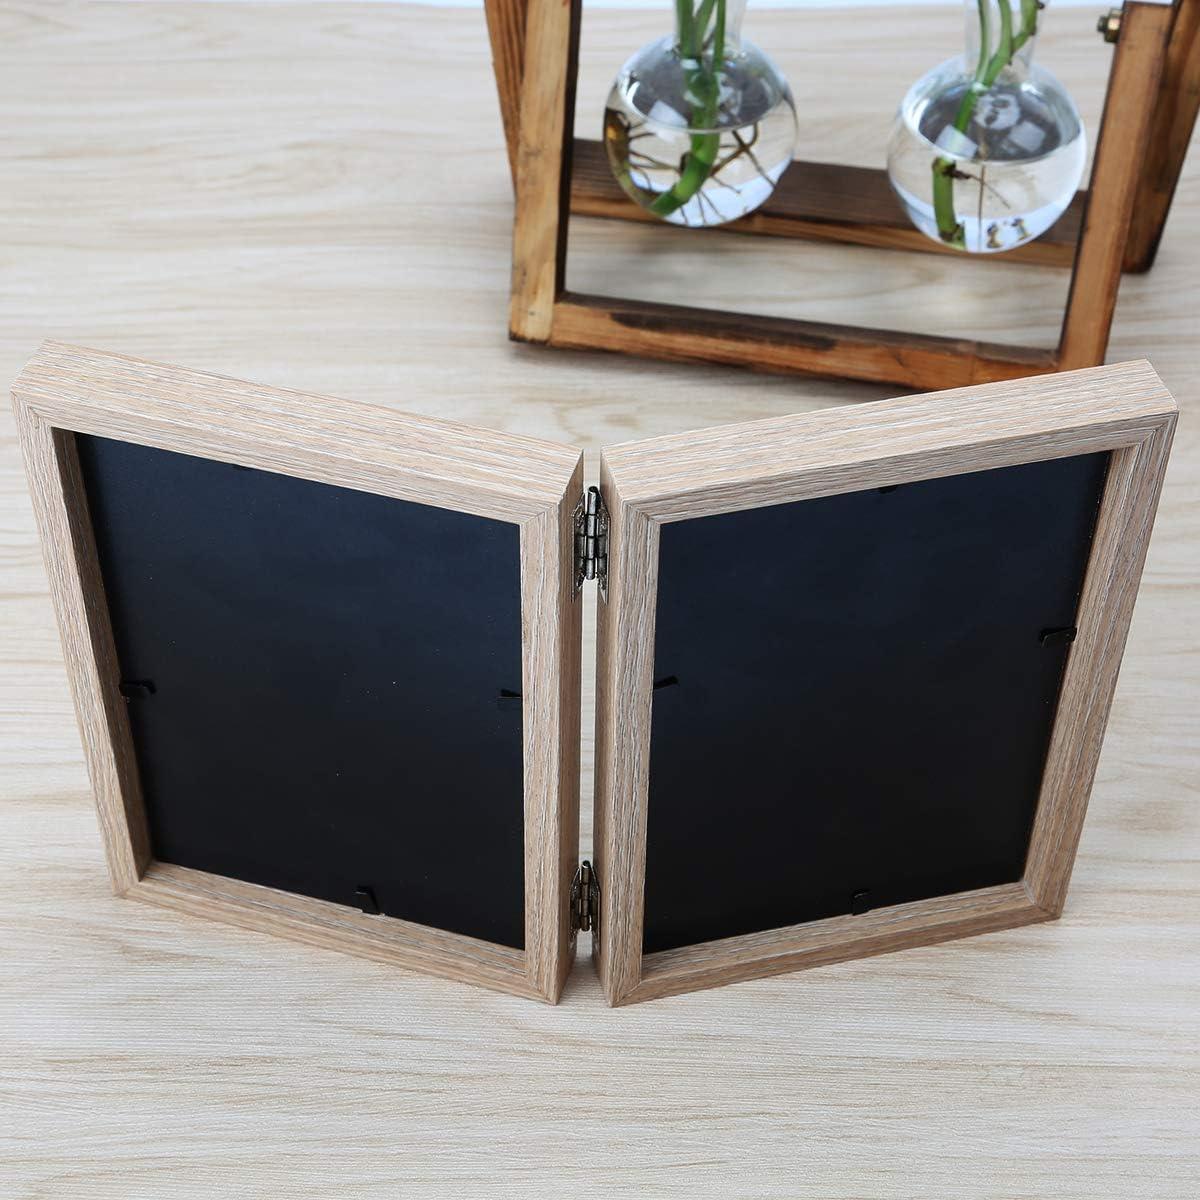 Holz Bilderrahmen Doppel Klappbar 10x15cm Bilderrahmen Desktop Fotorahmen Mit Glasfront